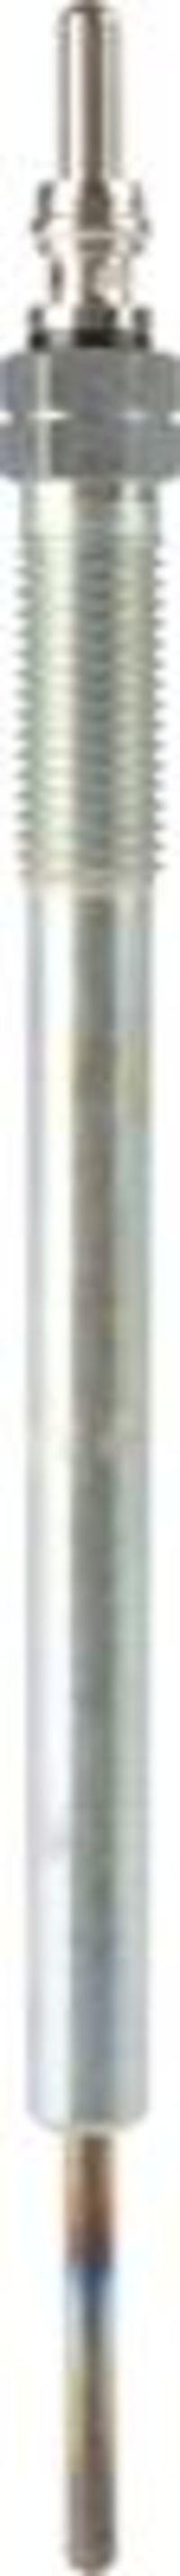 Свеча накаливания HERTH+BUSS JAKOPARTS J5715014